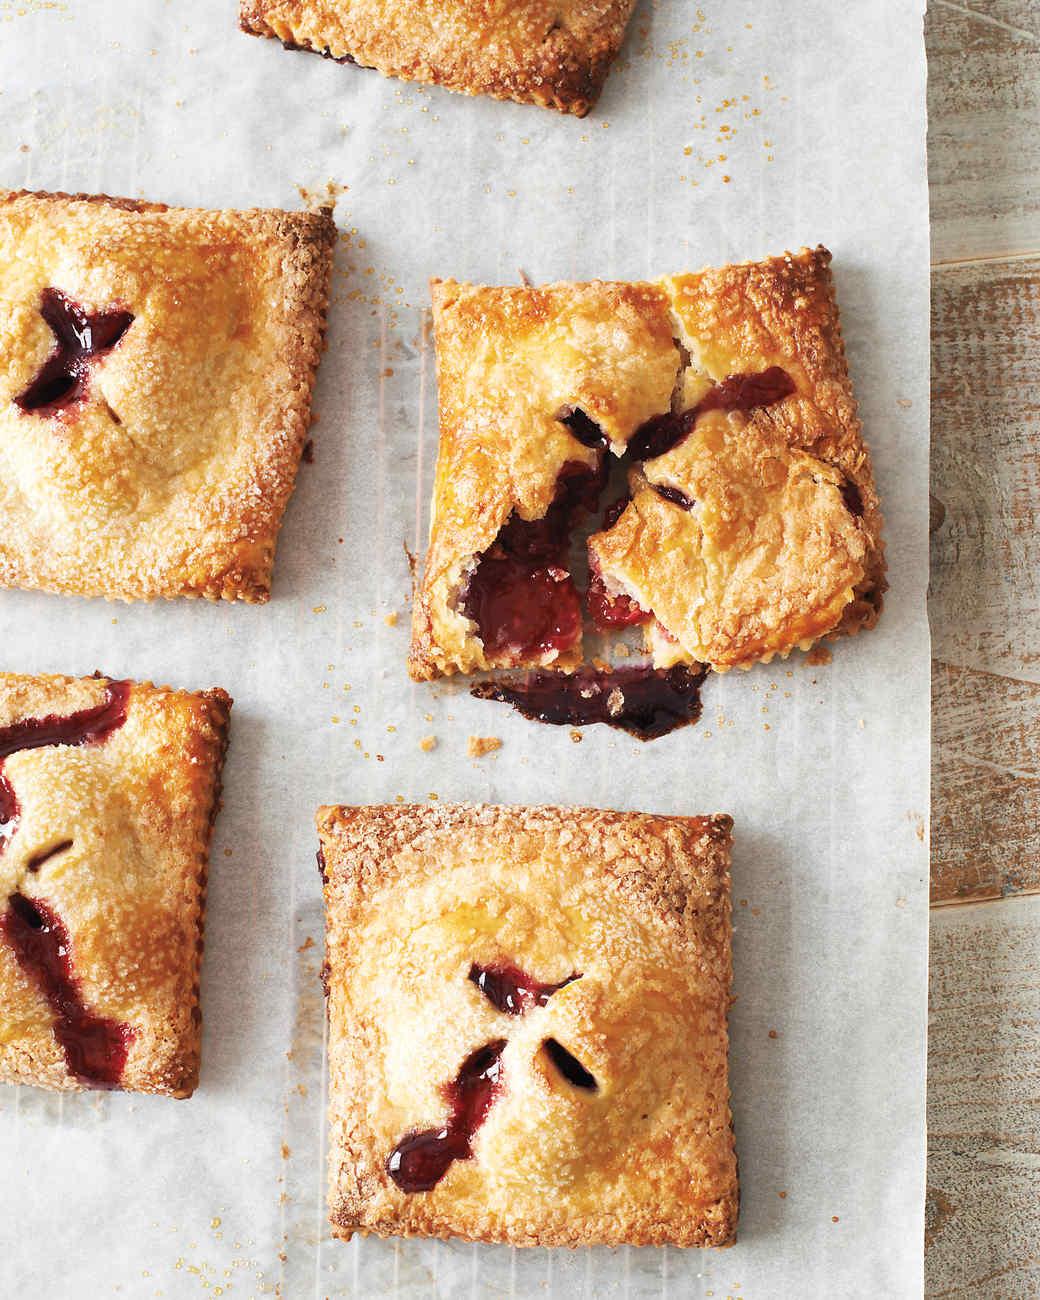 hand-pies-md110135.jpg